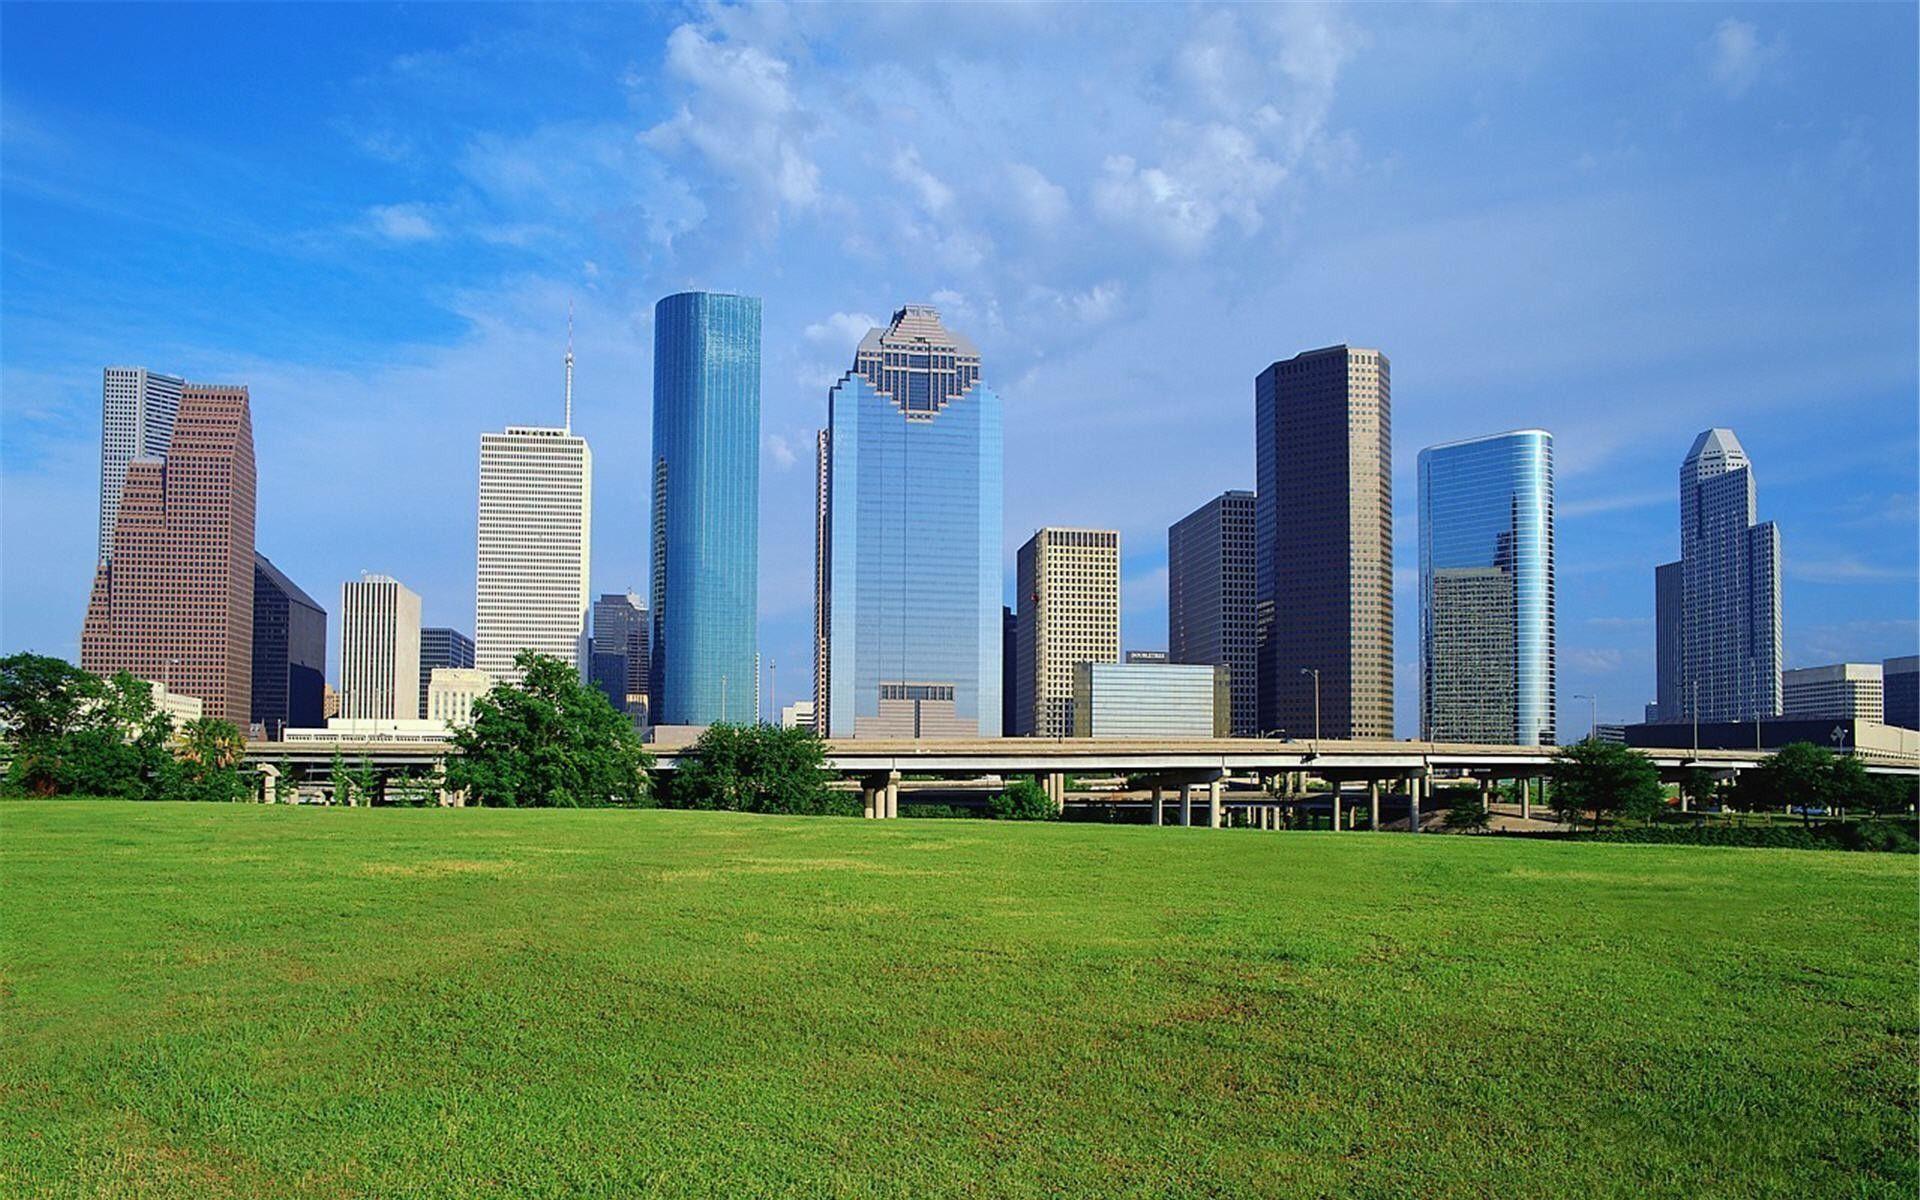 Wallpaperwiki Houston Skyline Image Download Free PIC